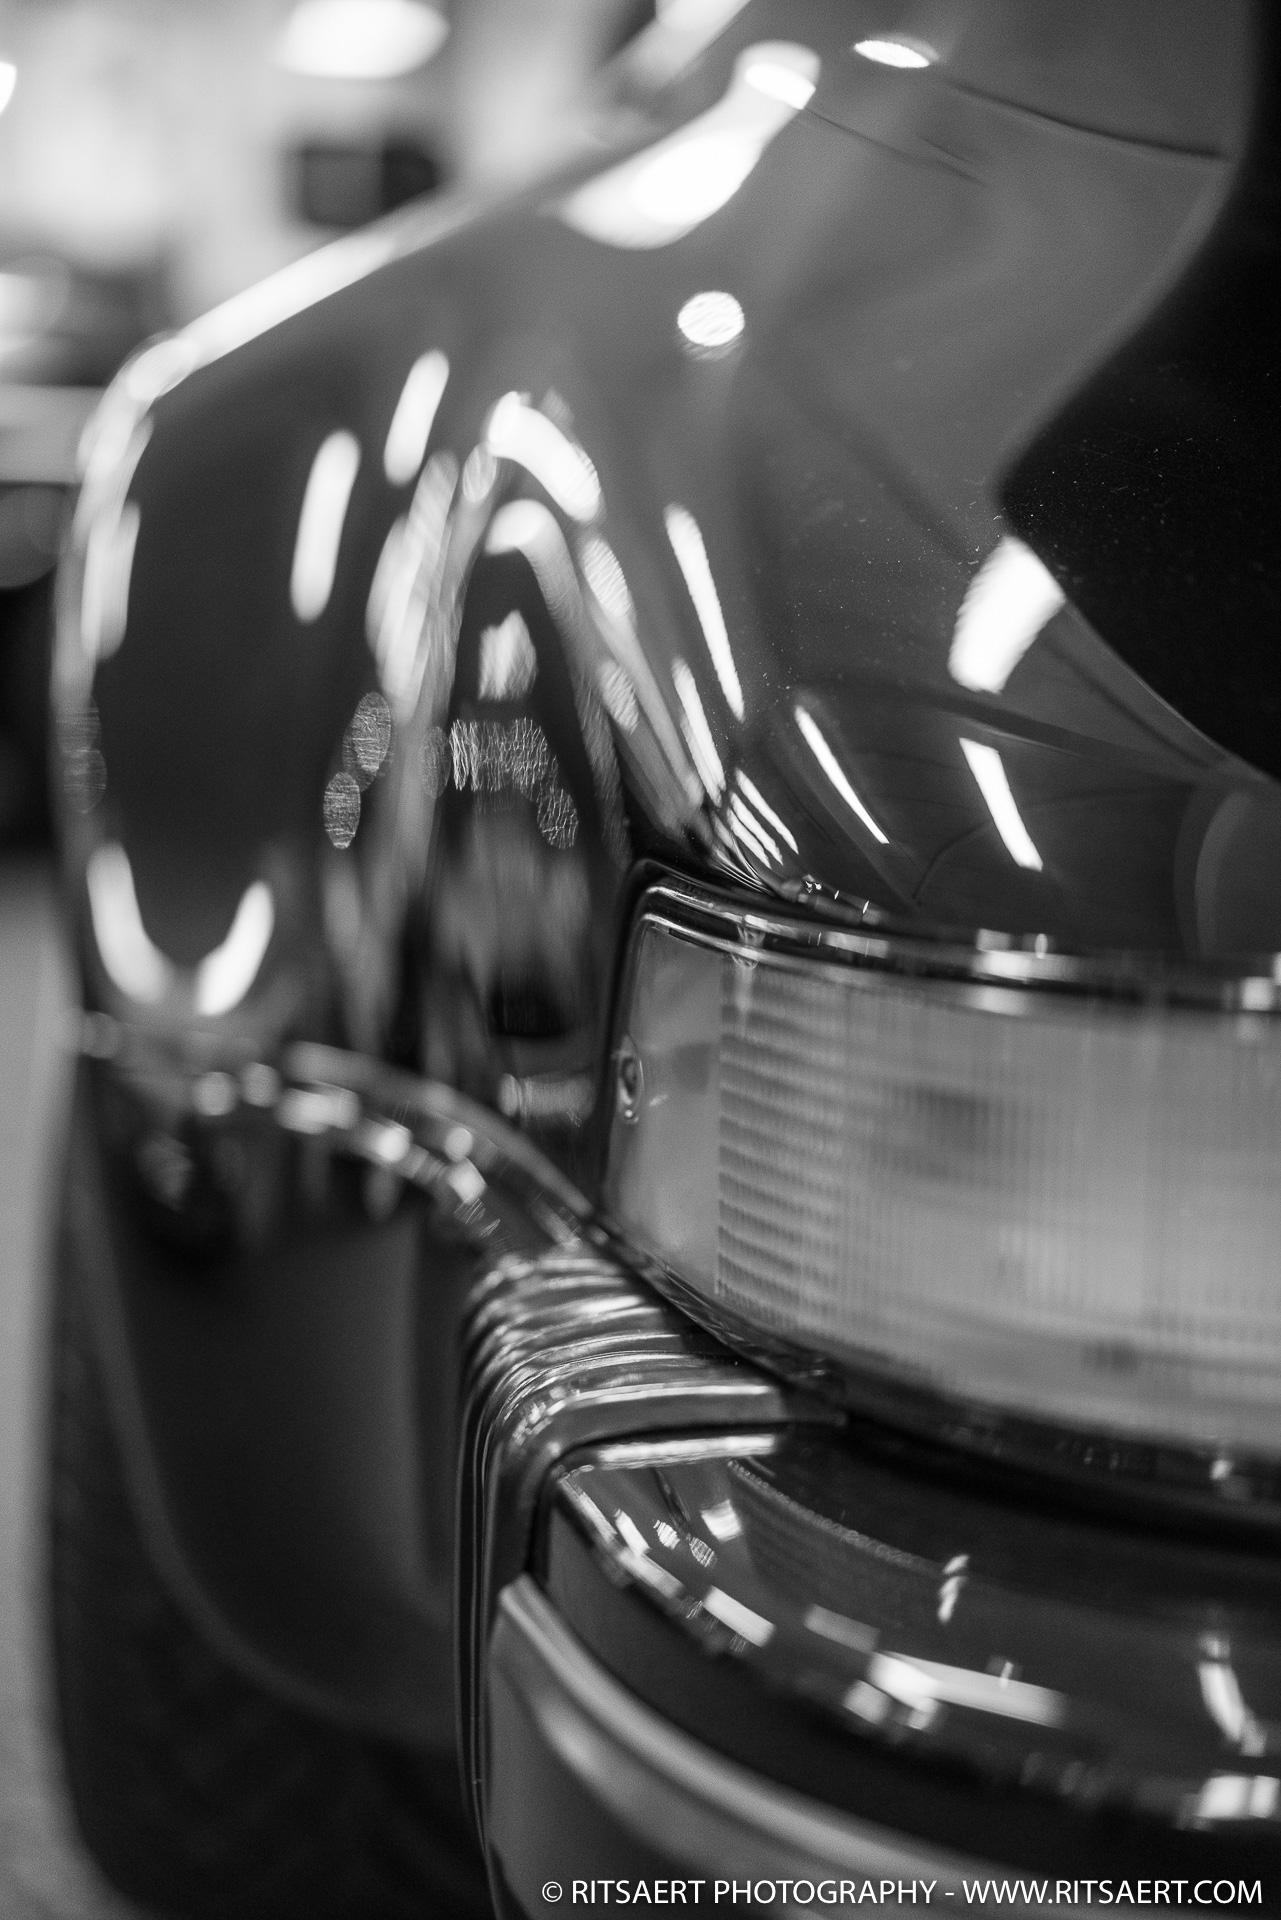 Classic 911 Turbo - Car details